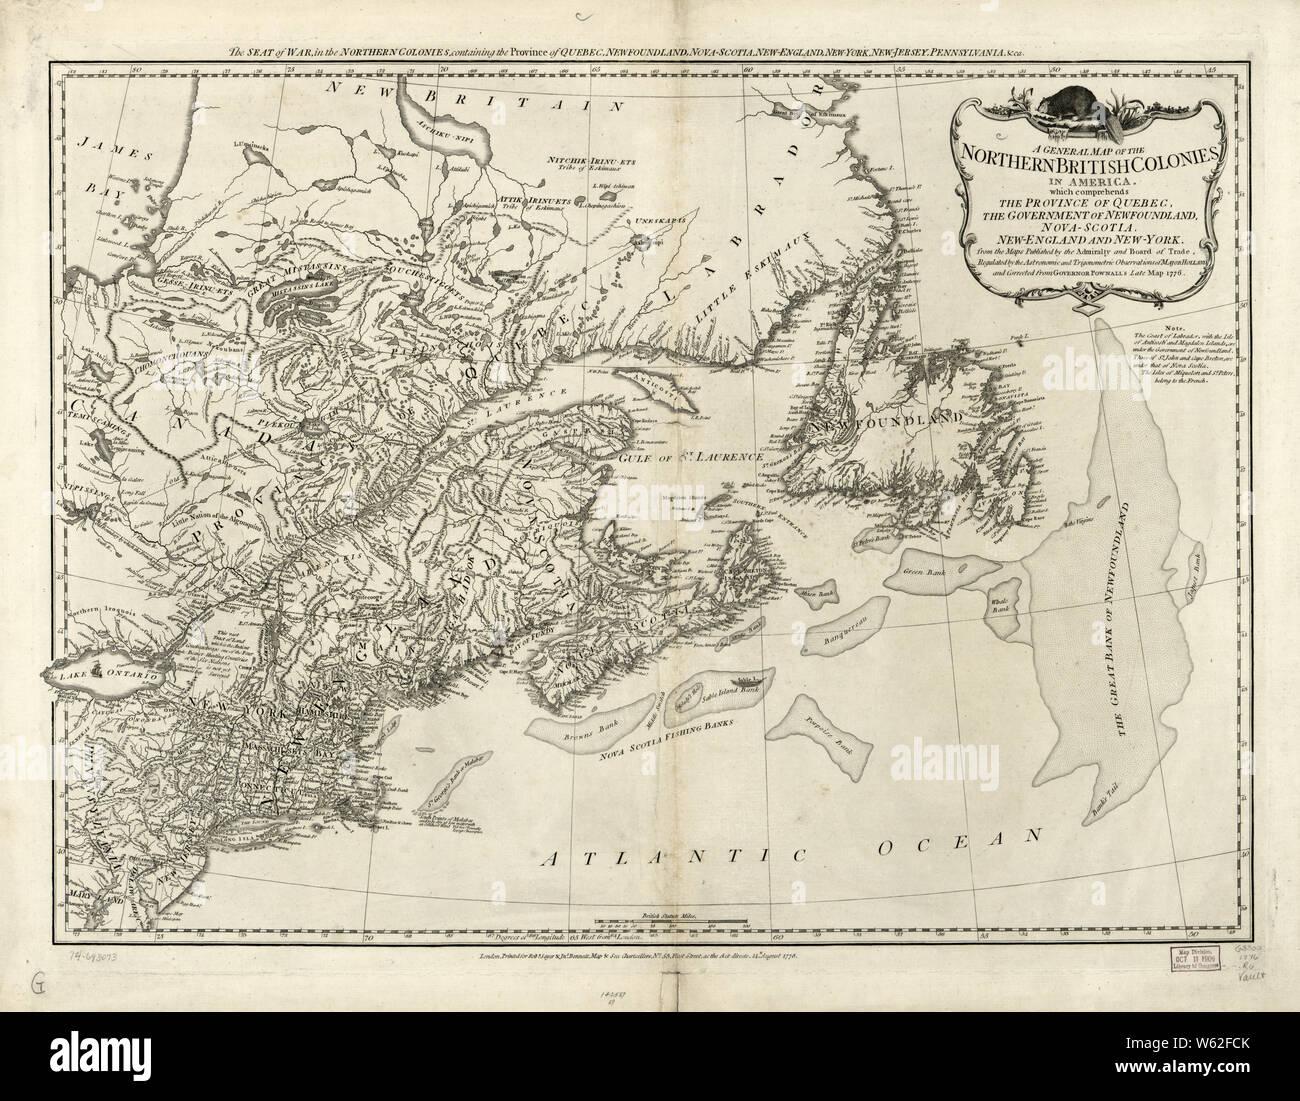 British Colonies Map Stock Photos & British Colonies Map ...